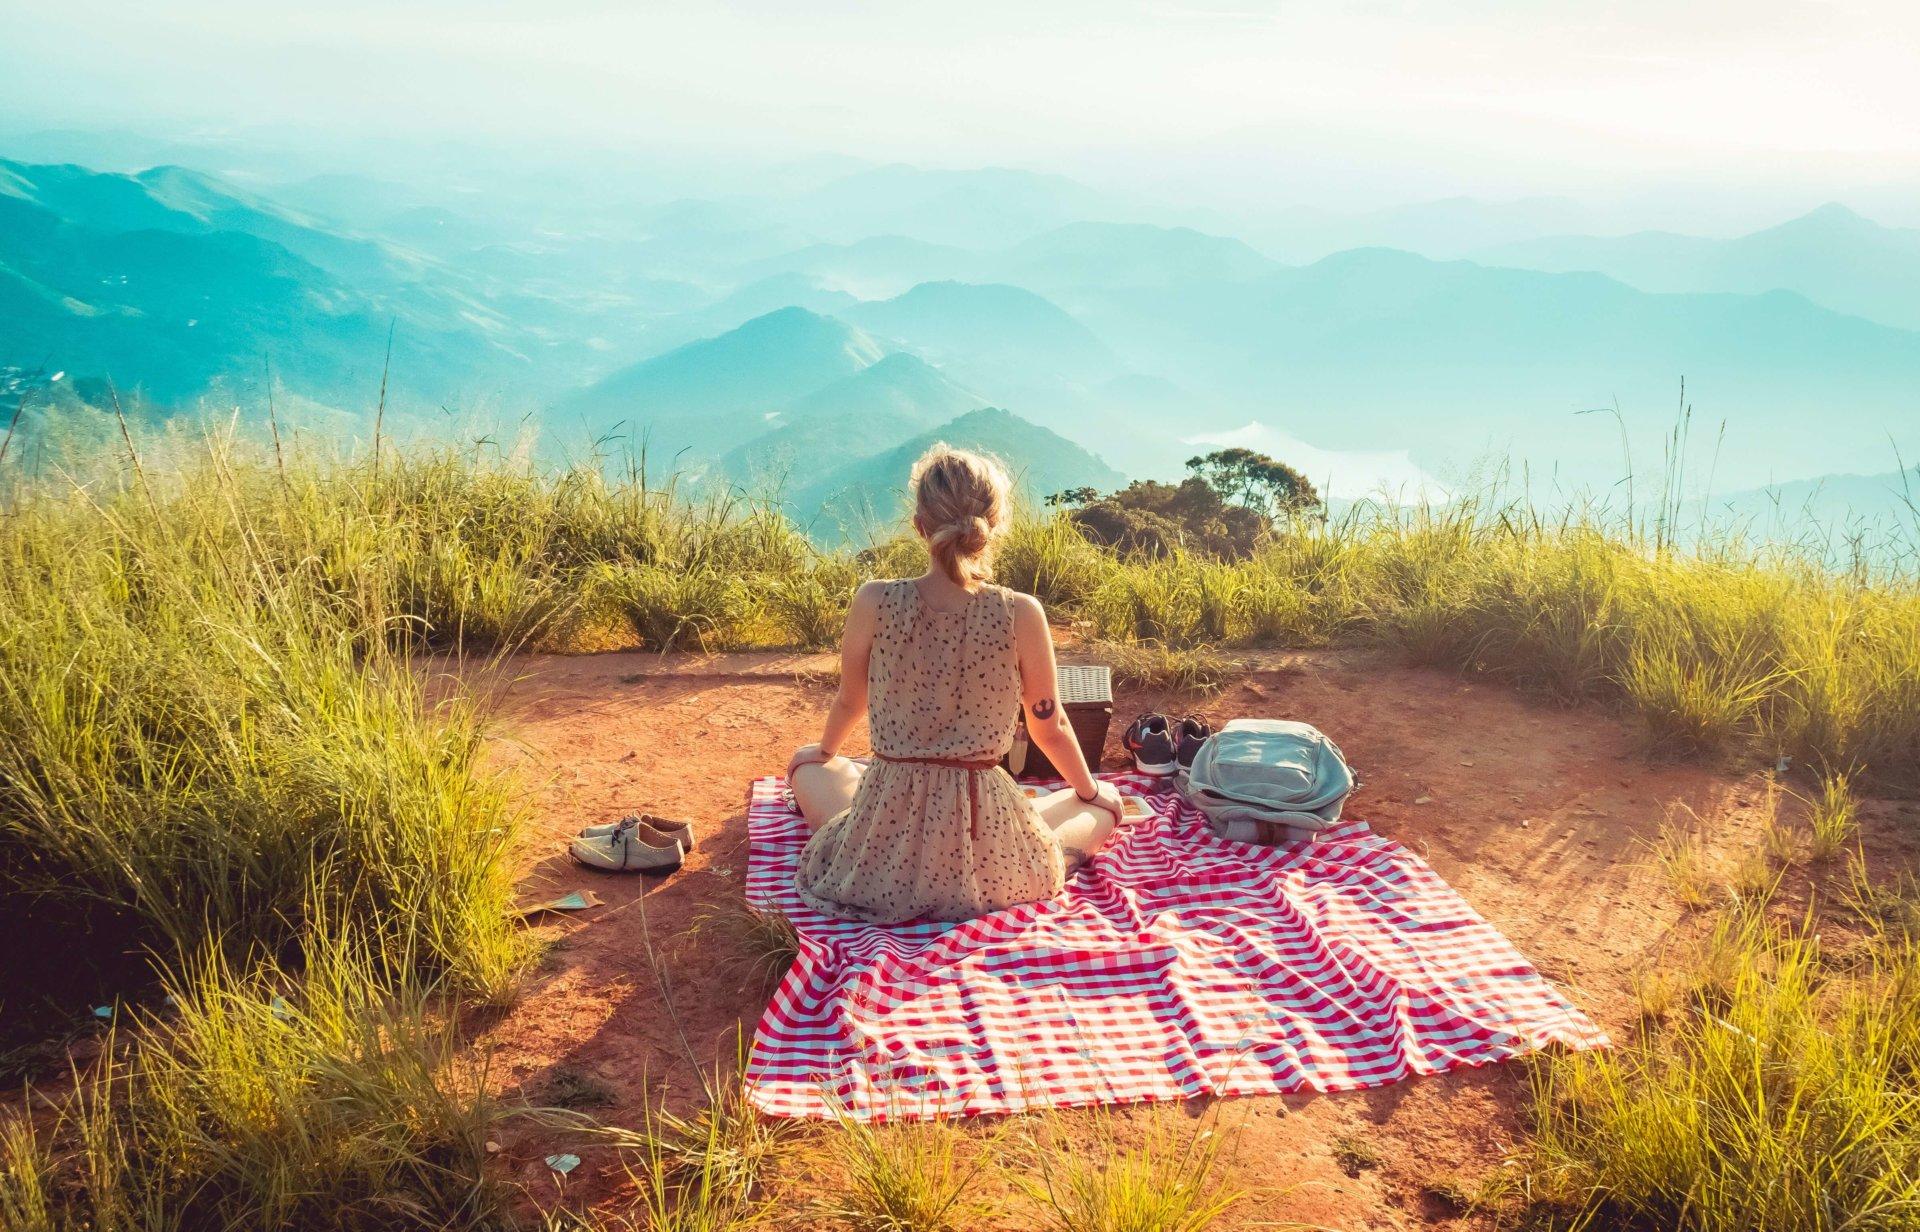 Woman picnic on mountain